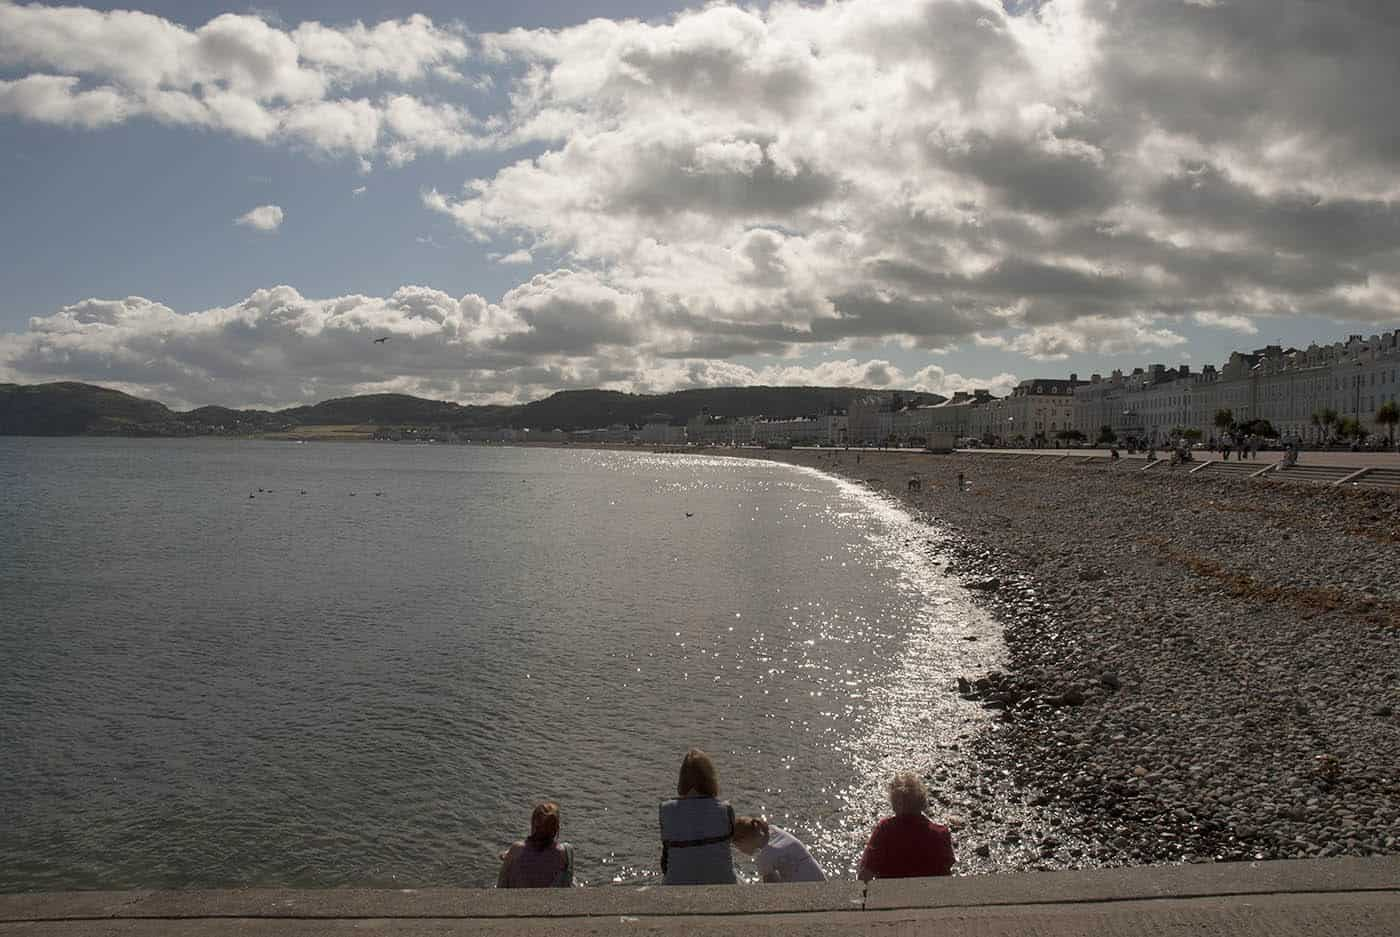 Llandudno North Shore beach, Llandudno, Conwy, Wales